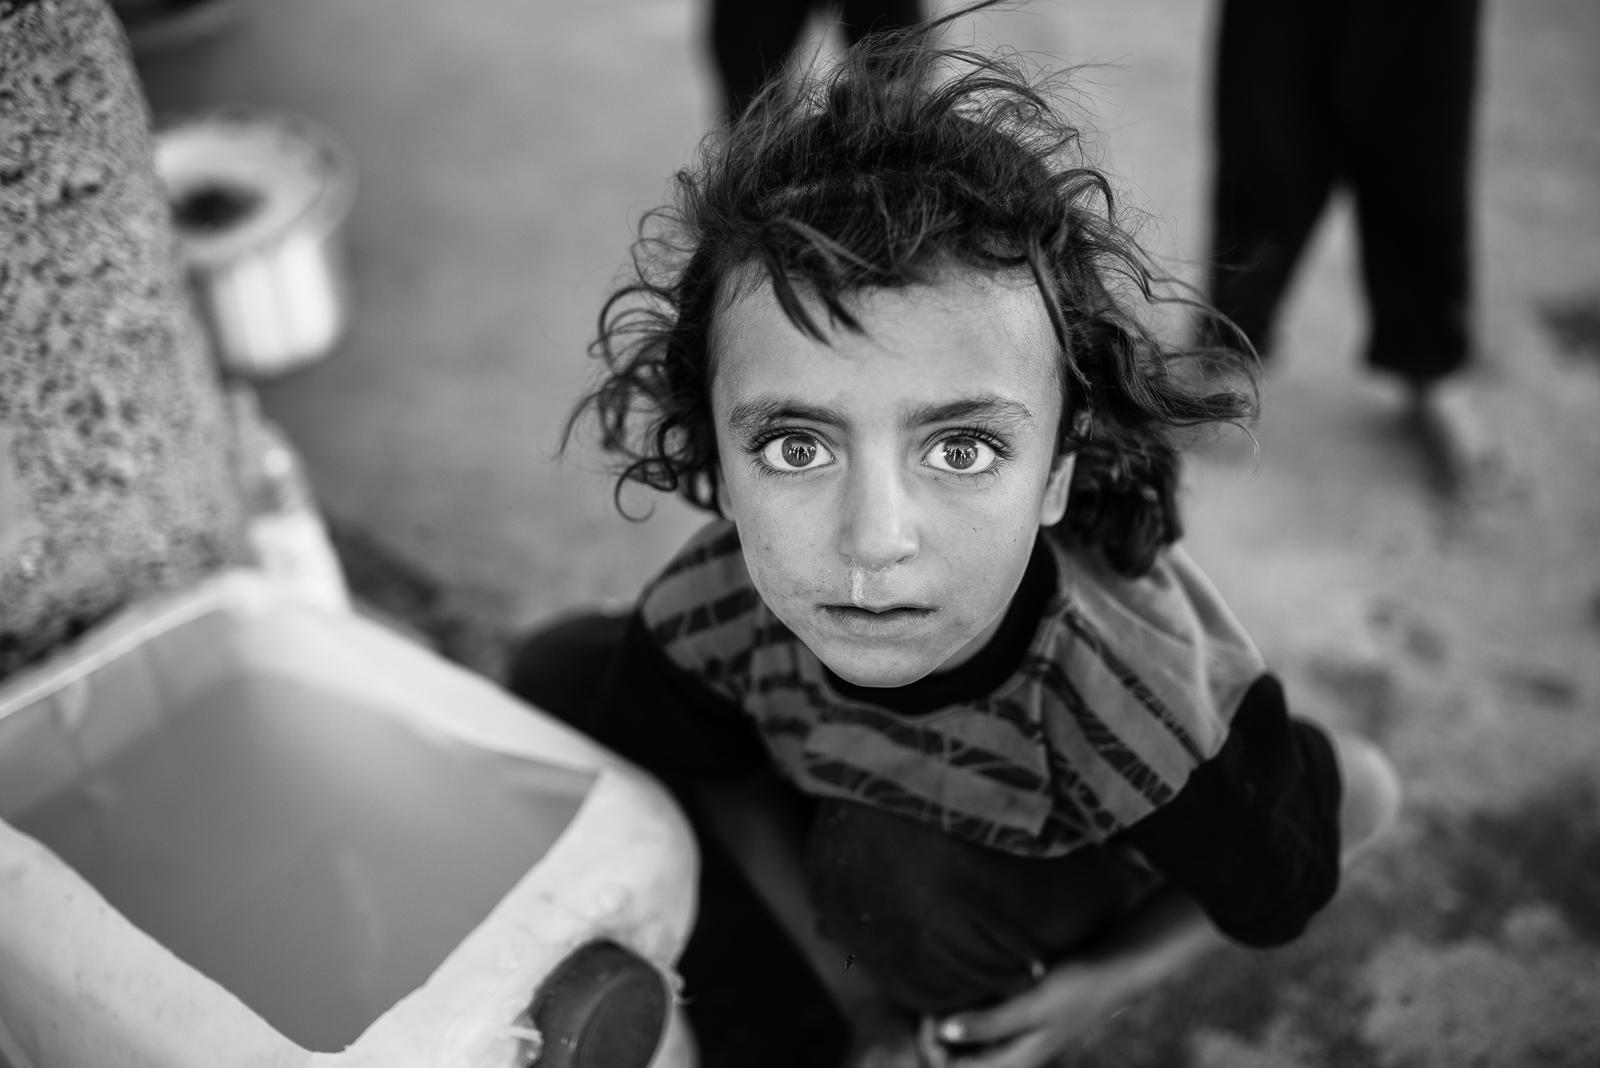 Little girl inside an under construction building in Zakho